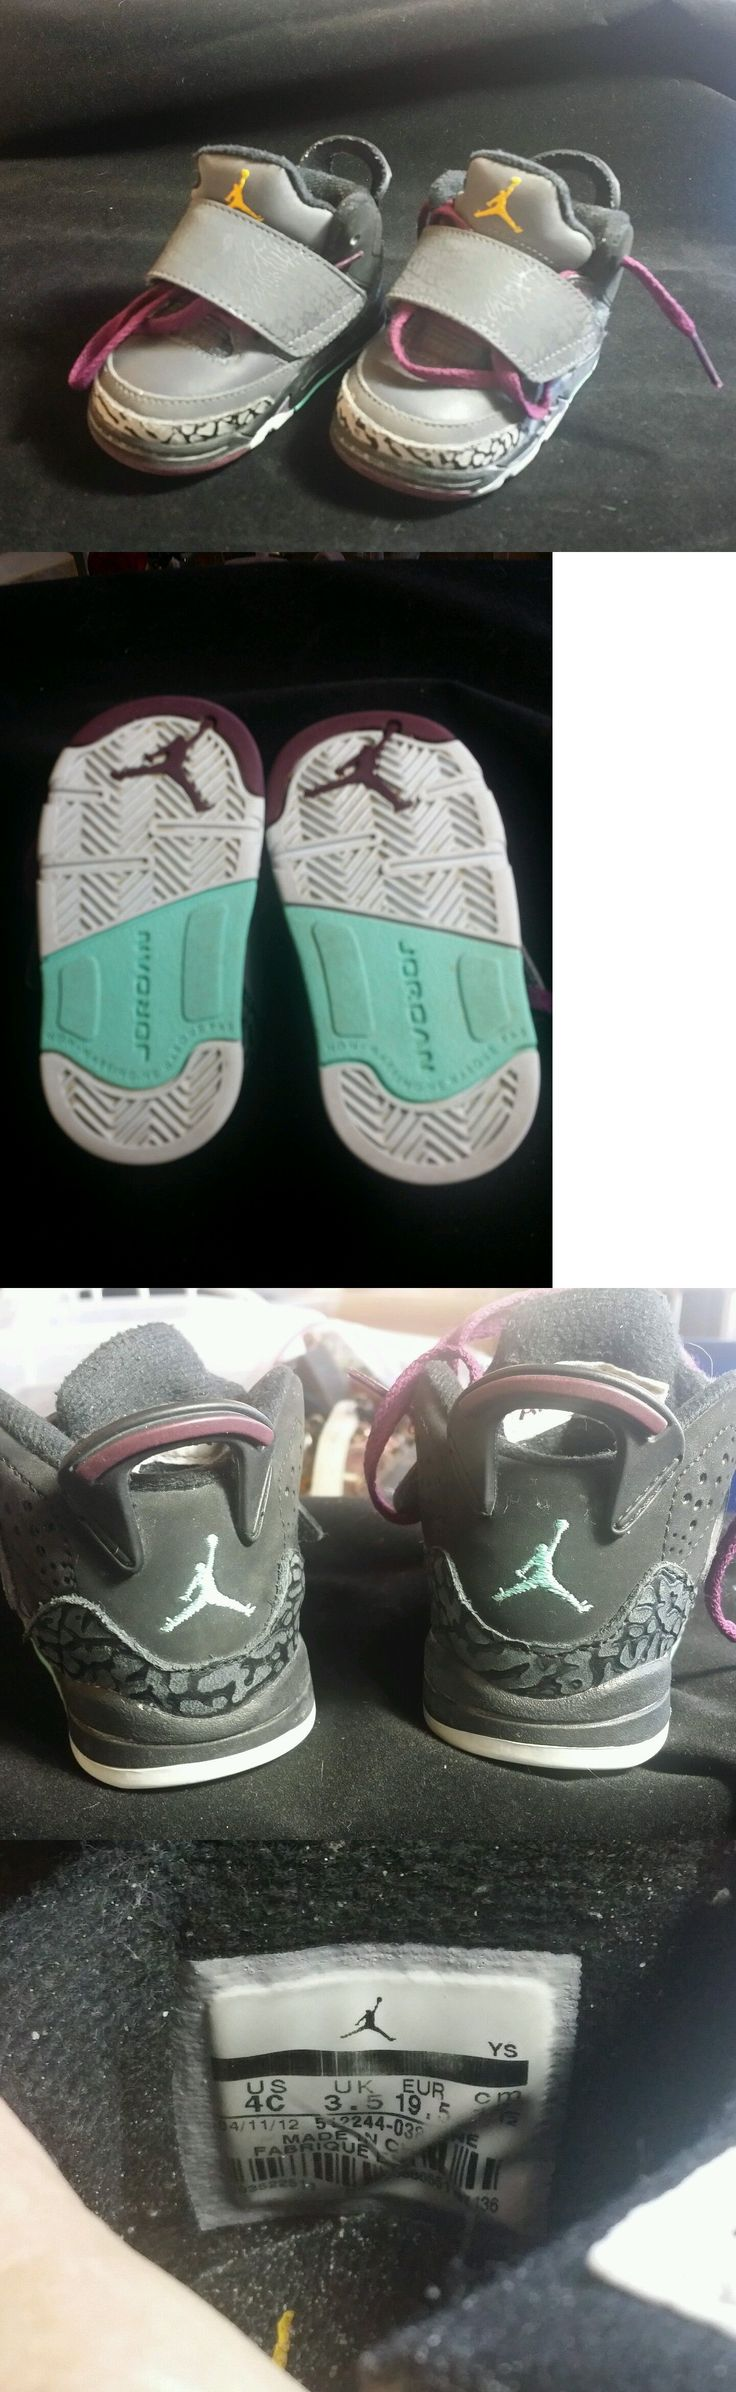 Michael Jordan Baby Clothing: Baby Air Michael Jordan Nike Shoes, Size 4C -> BUY IT NOW ONLY: $9.95 on eBay!